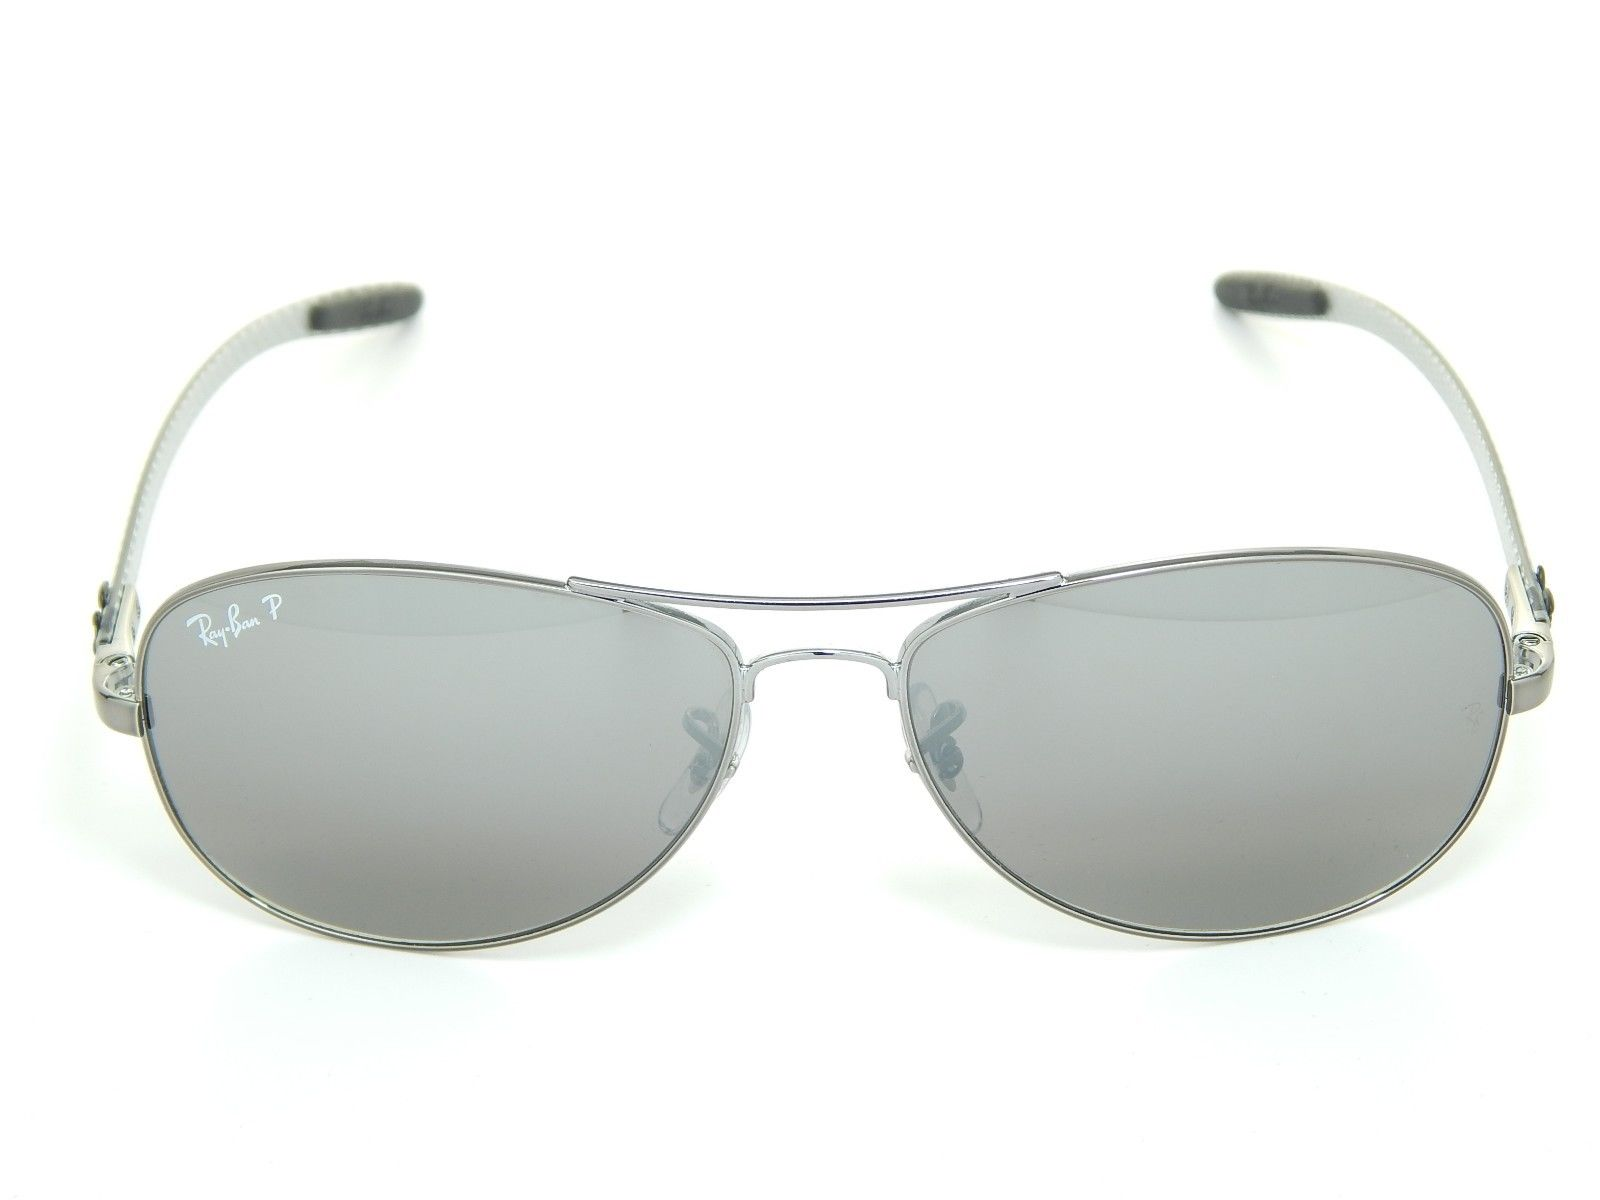 RAY BAN RB8301 004/N8 TECH Gray Mirror Polarized 59mm